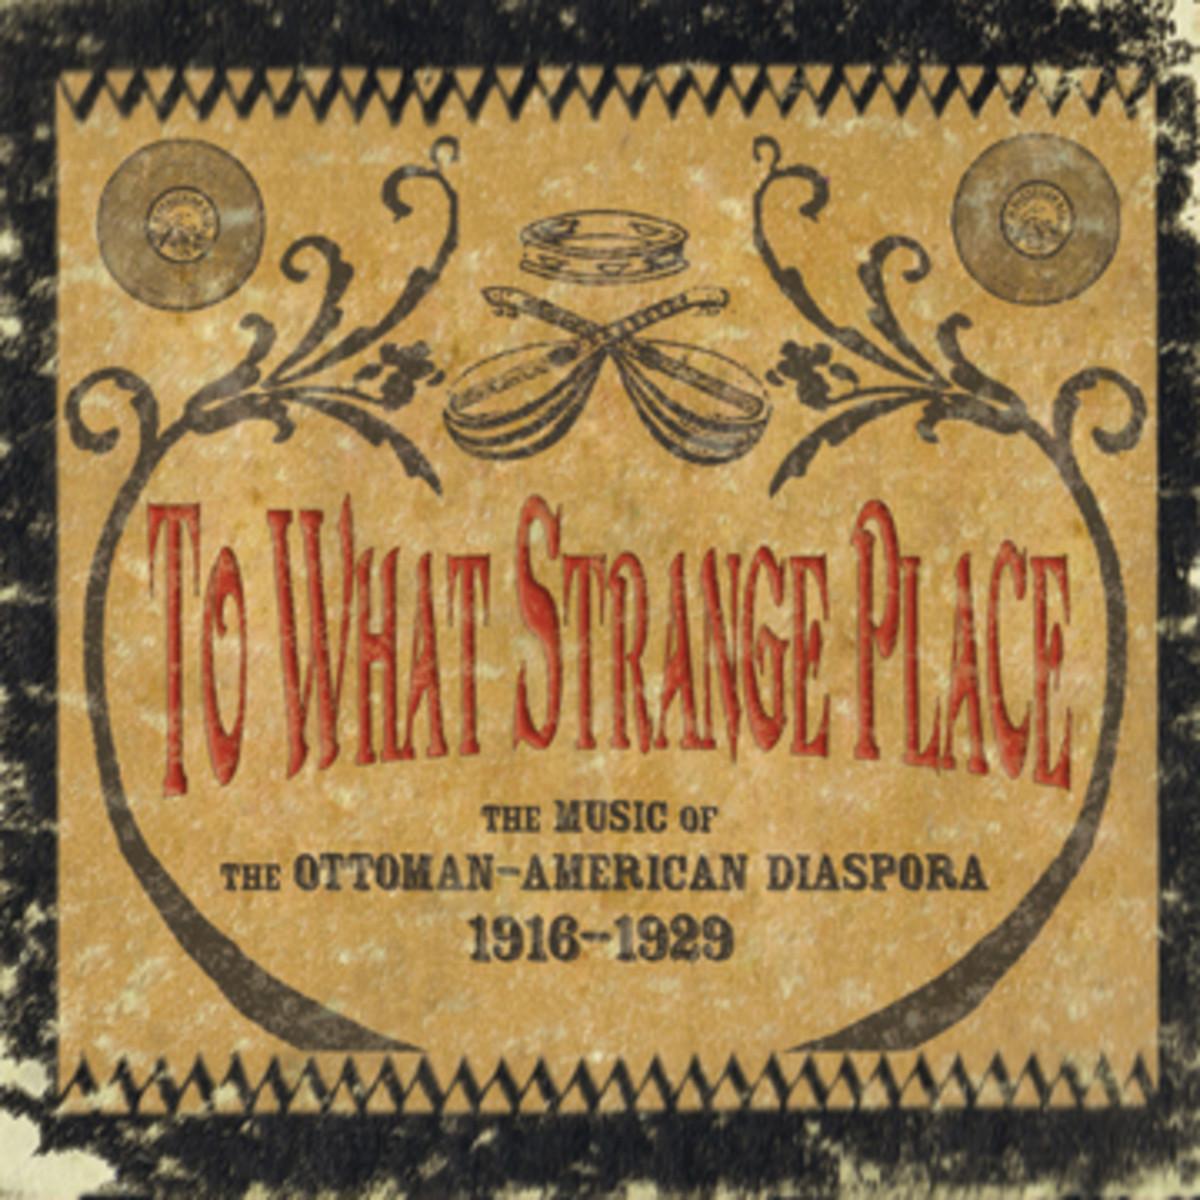 To What Strange Place The Music of the Ottoman-Armenian Diaspora